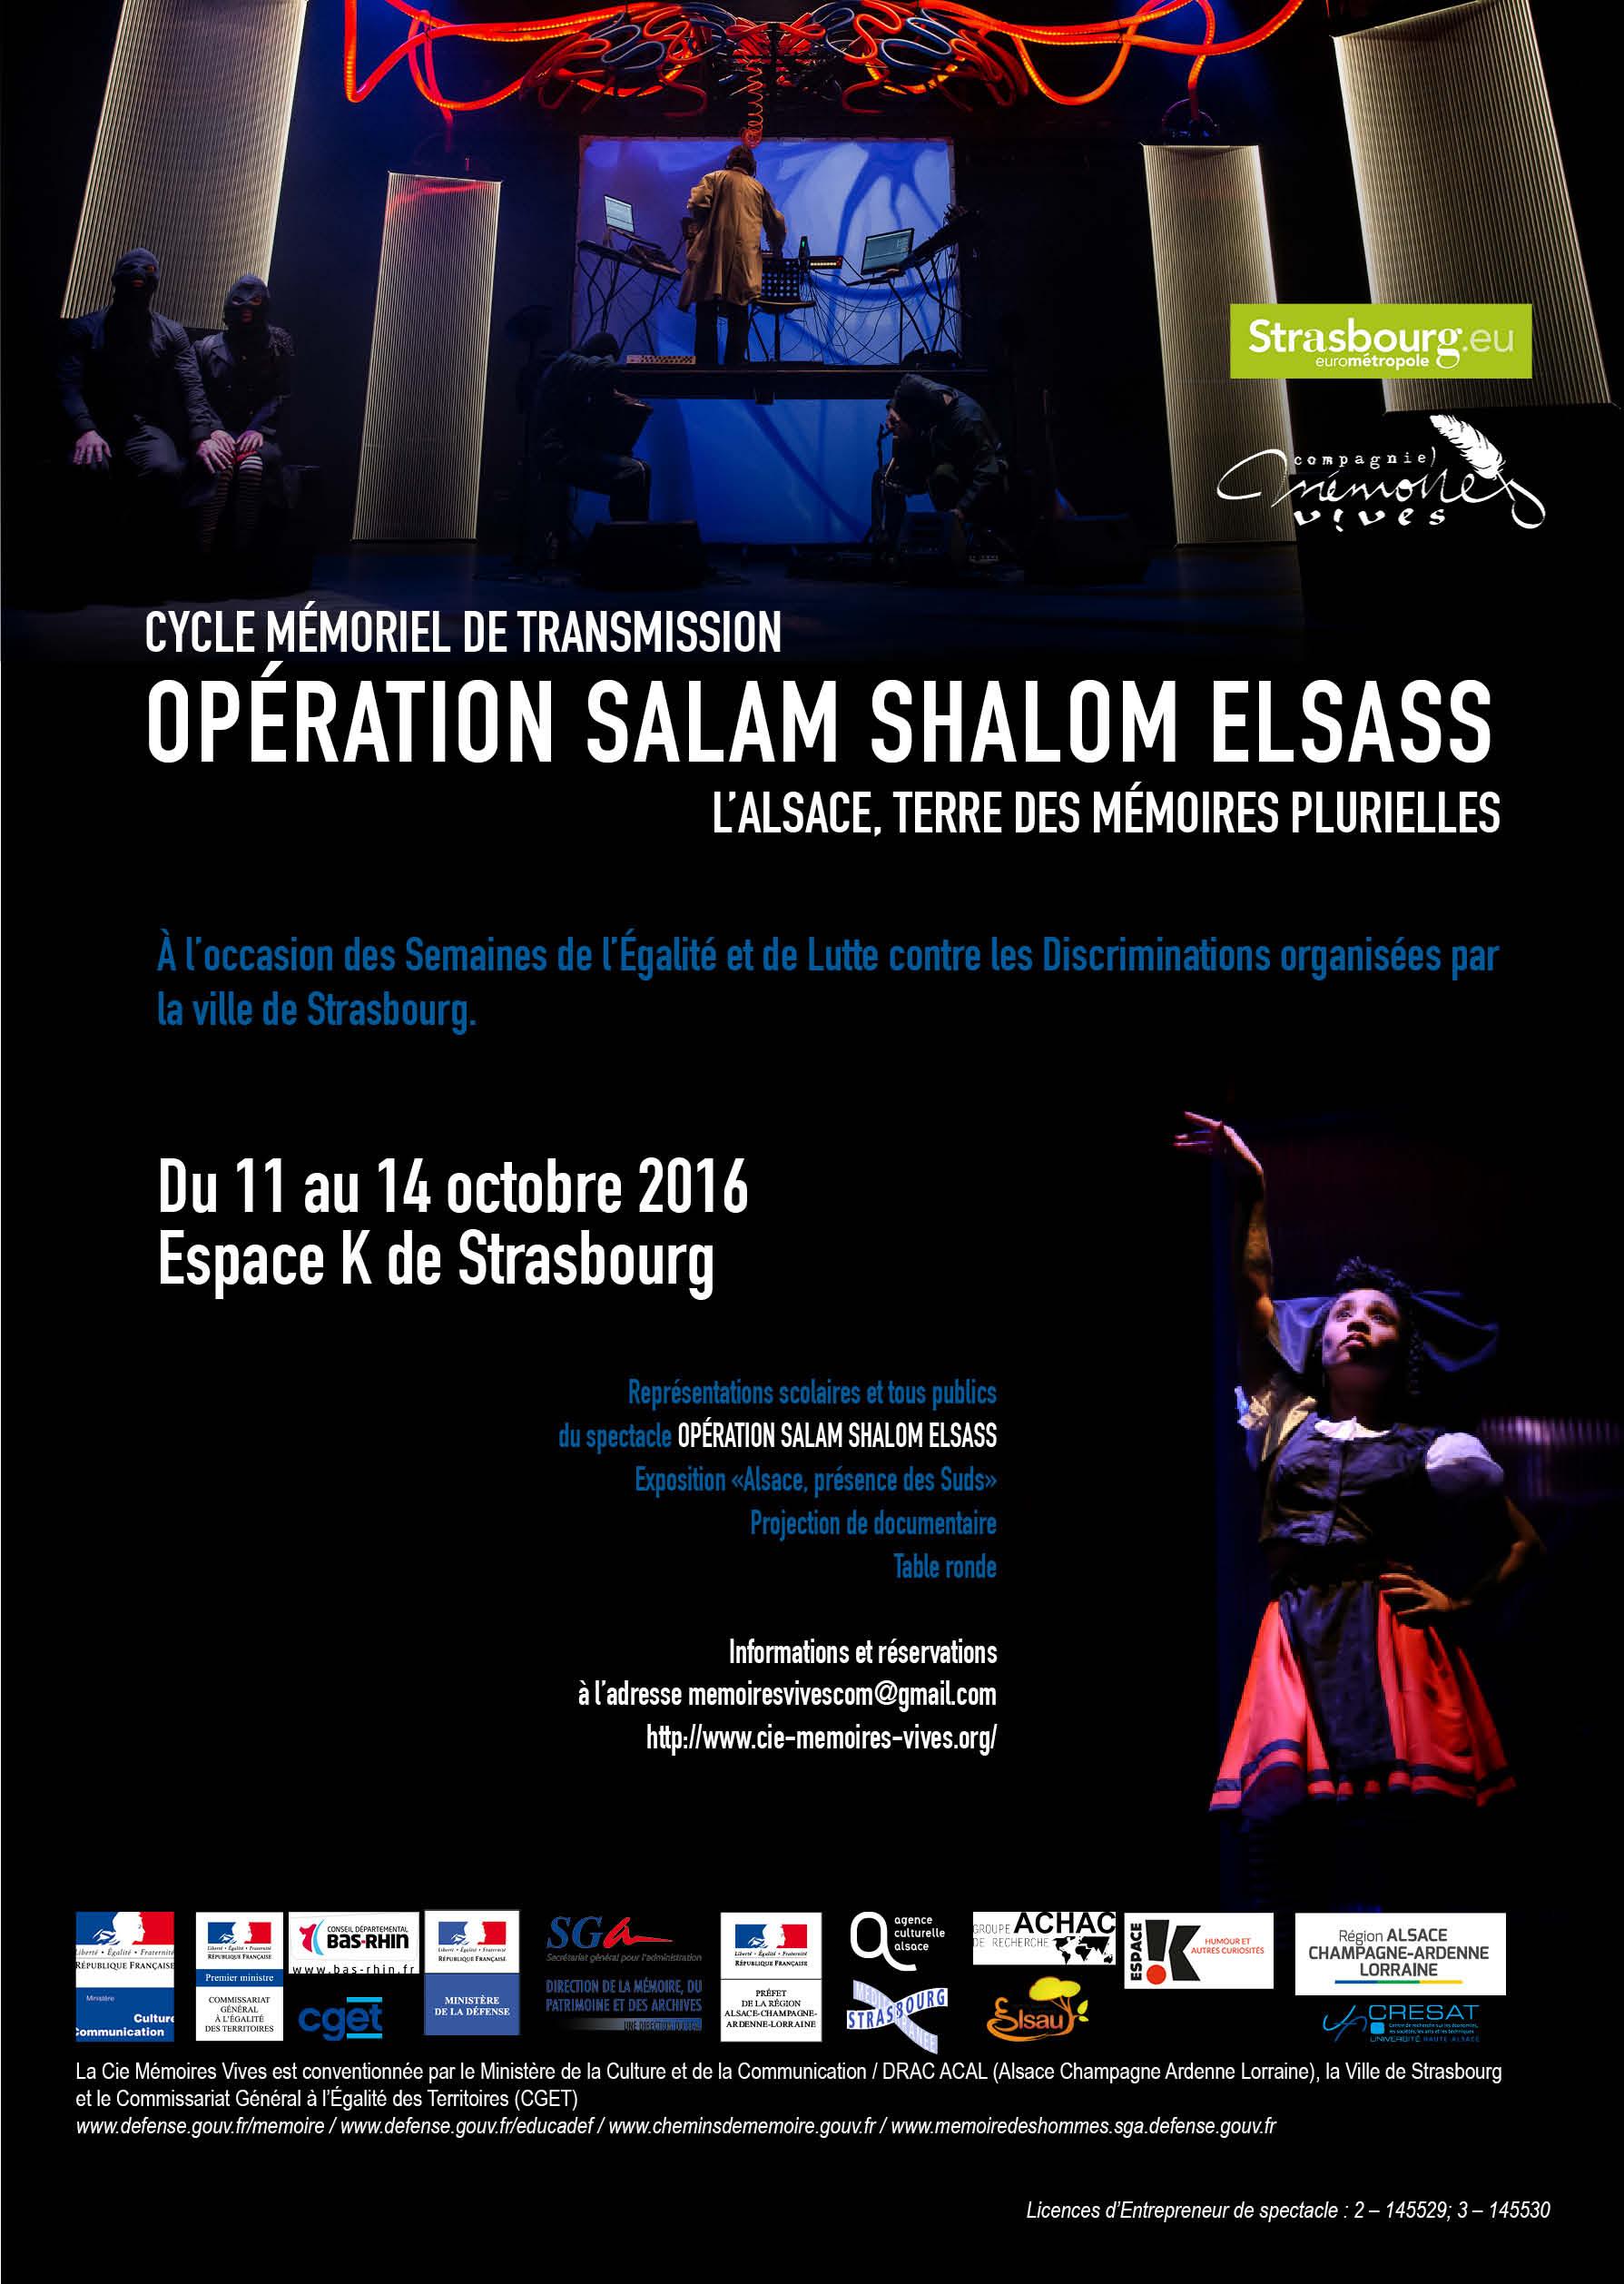 affiche OPÉRATION SALAM SHALOM